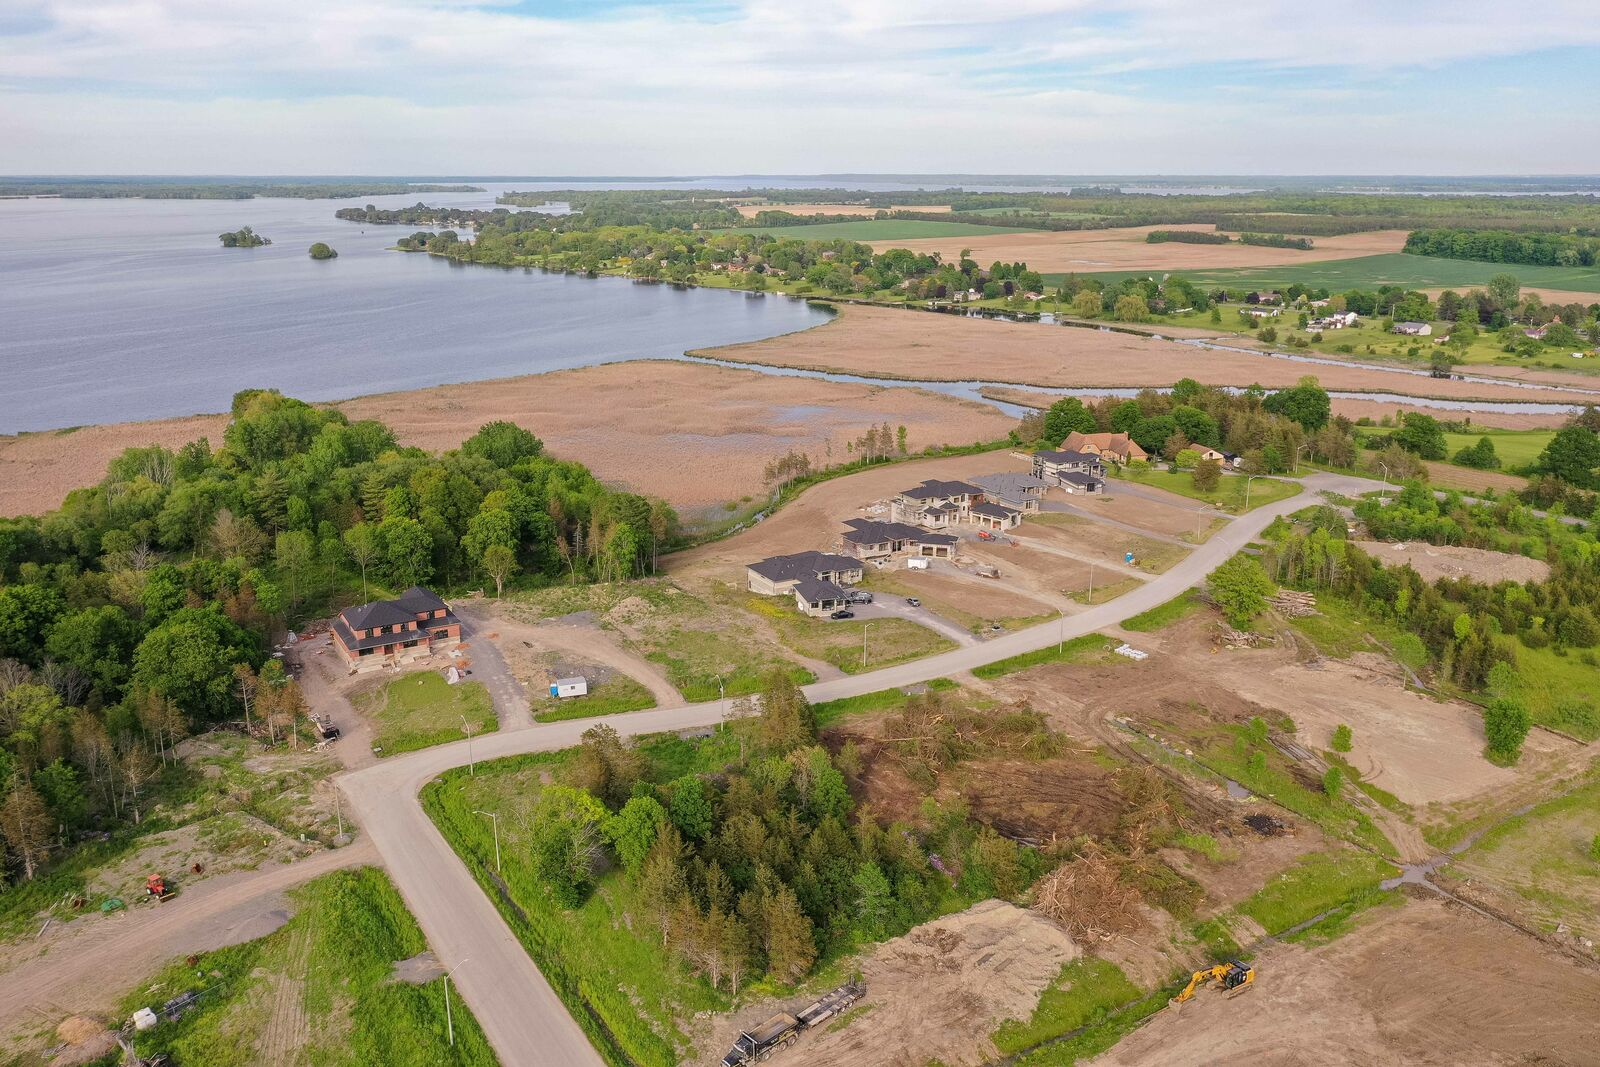 11 Watermark Development Aerial Watermark on the Bay